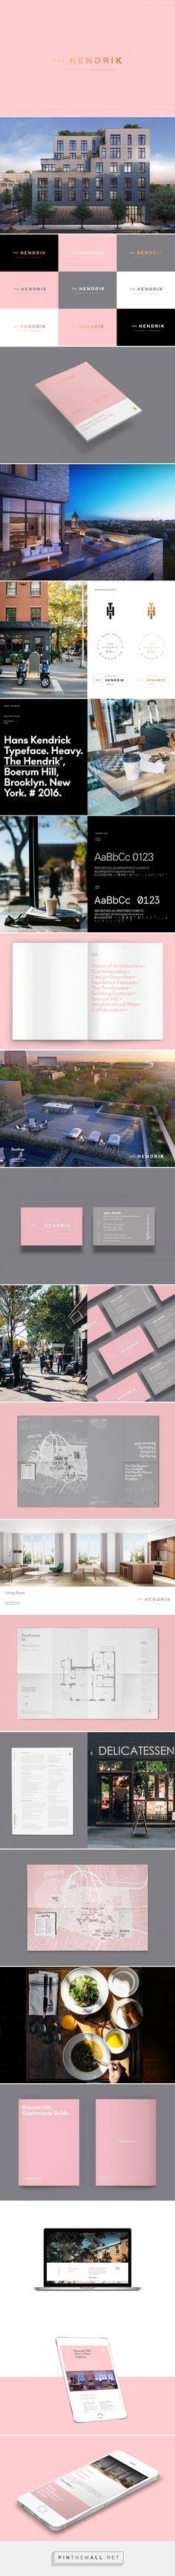 Identity Design, Brochure Design, Visual Identity, Brand Identity, Layout Design, Web Design, Logo Design, Graphic Design, Corporate Branding